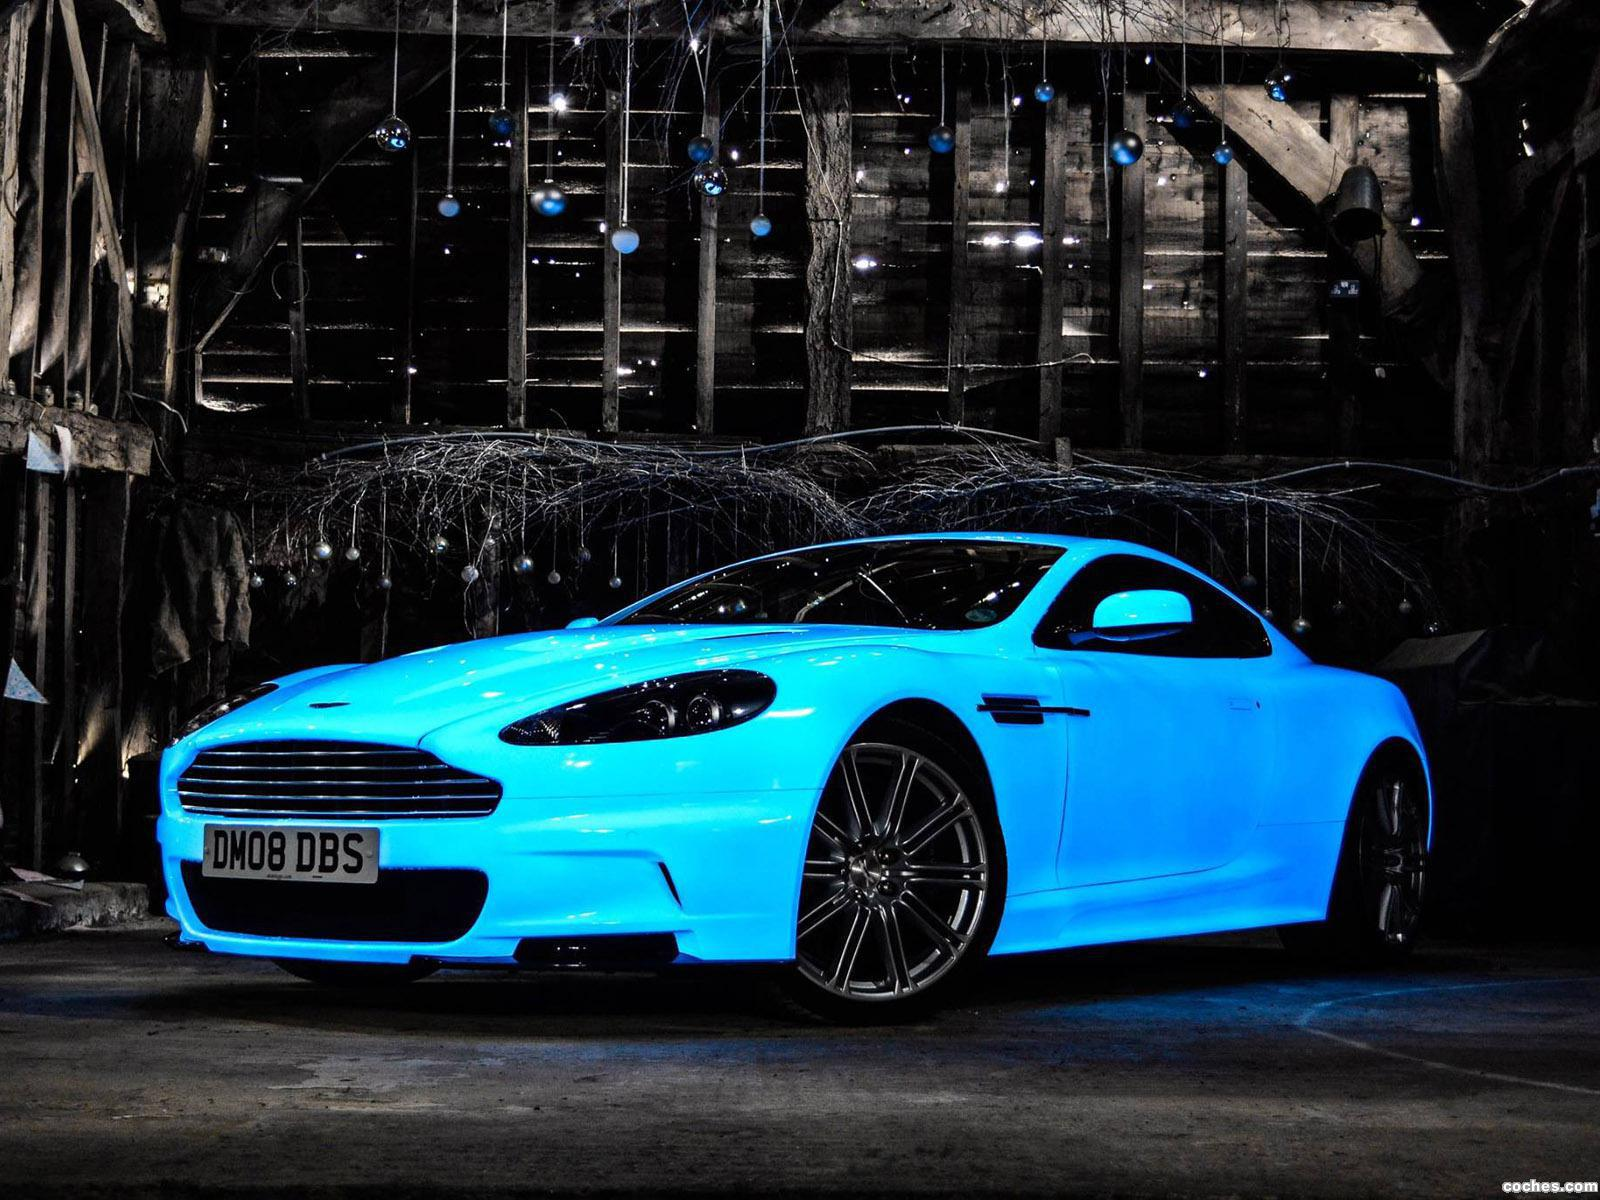 Foto 0 de Aston Martin DBS Nevana Designs 2015